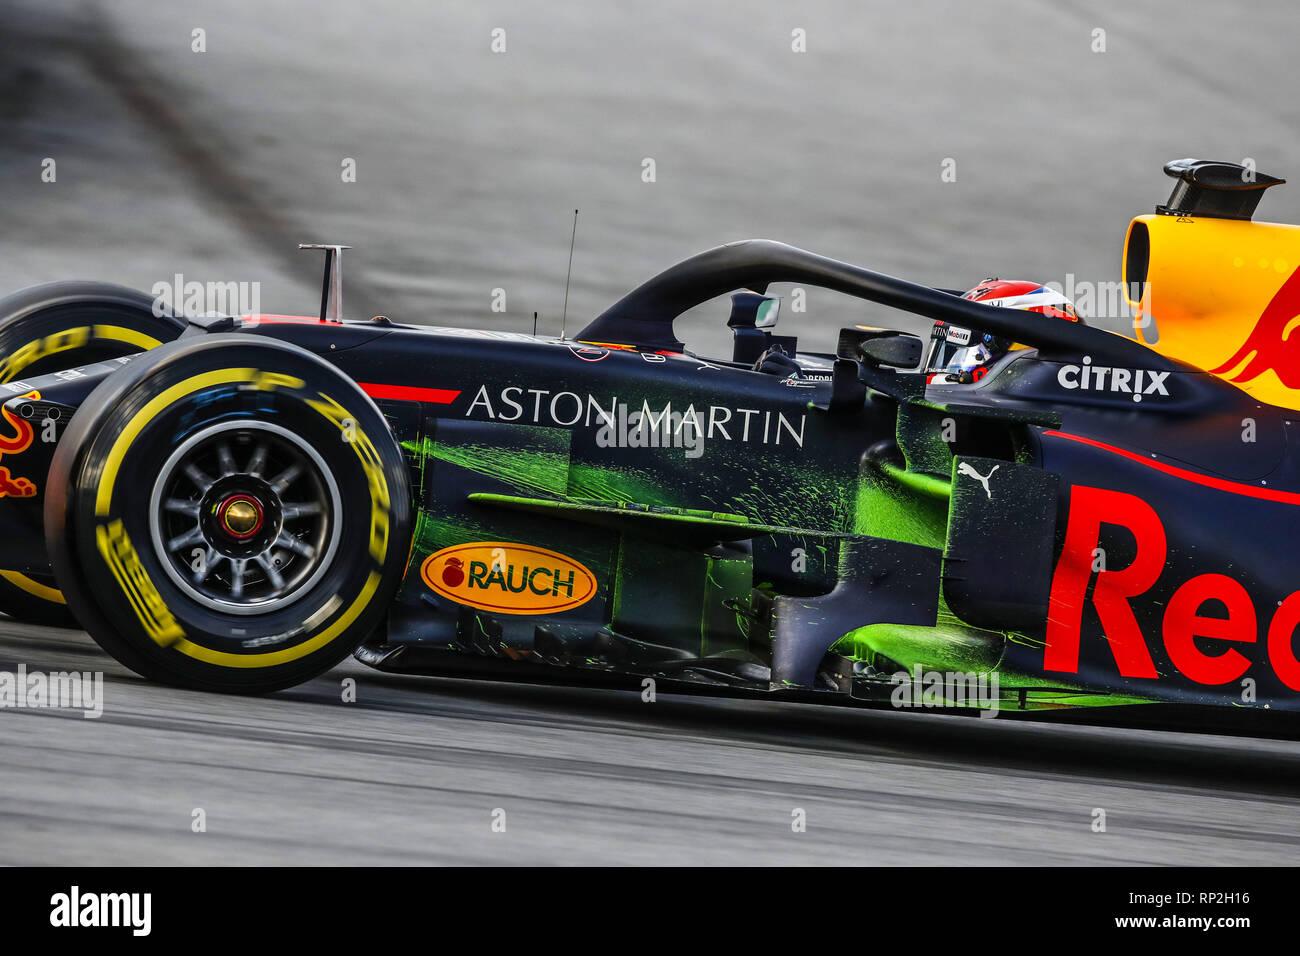 Barcelona Spain 19th Feb 2019 10 Gasly Pierre Fra Aston Martin Red Bull Racing Honda Rb15